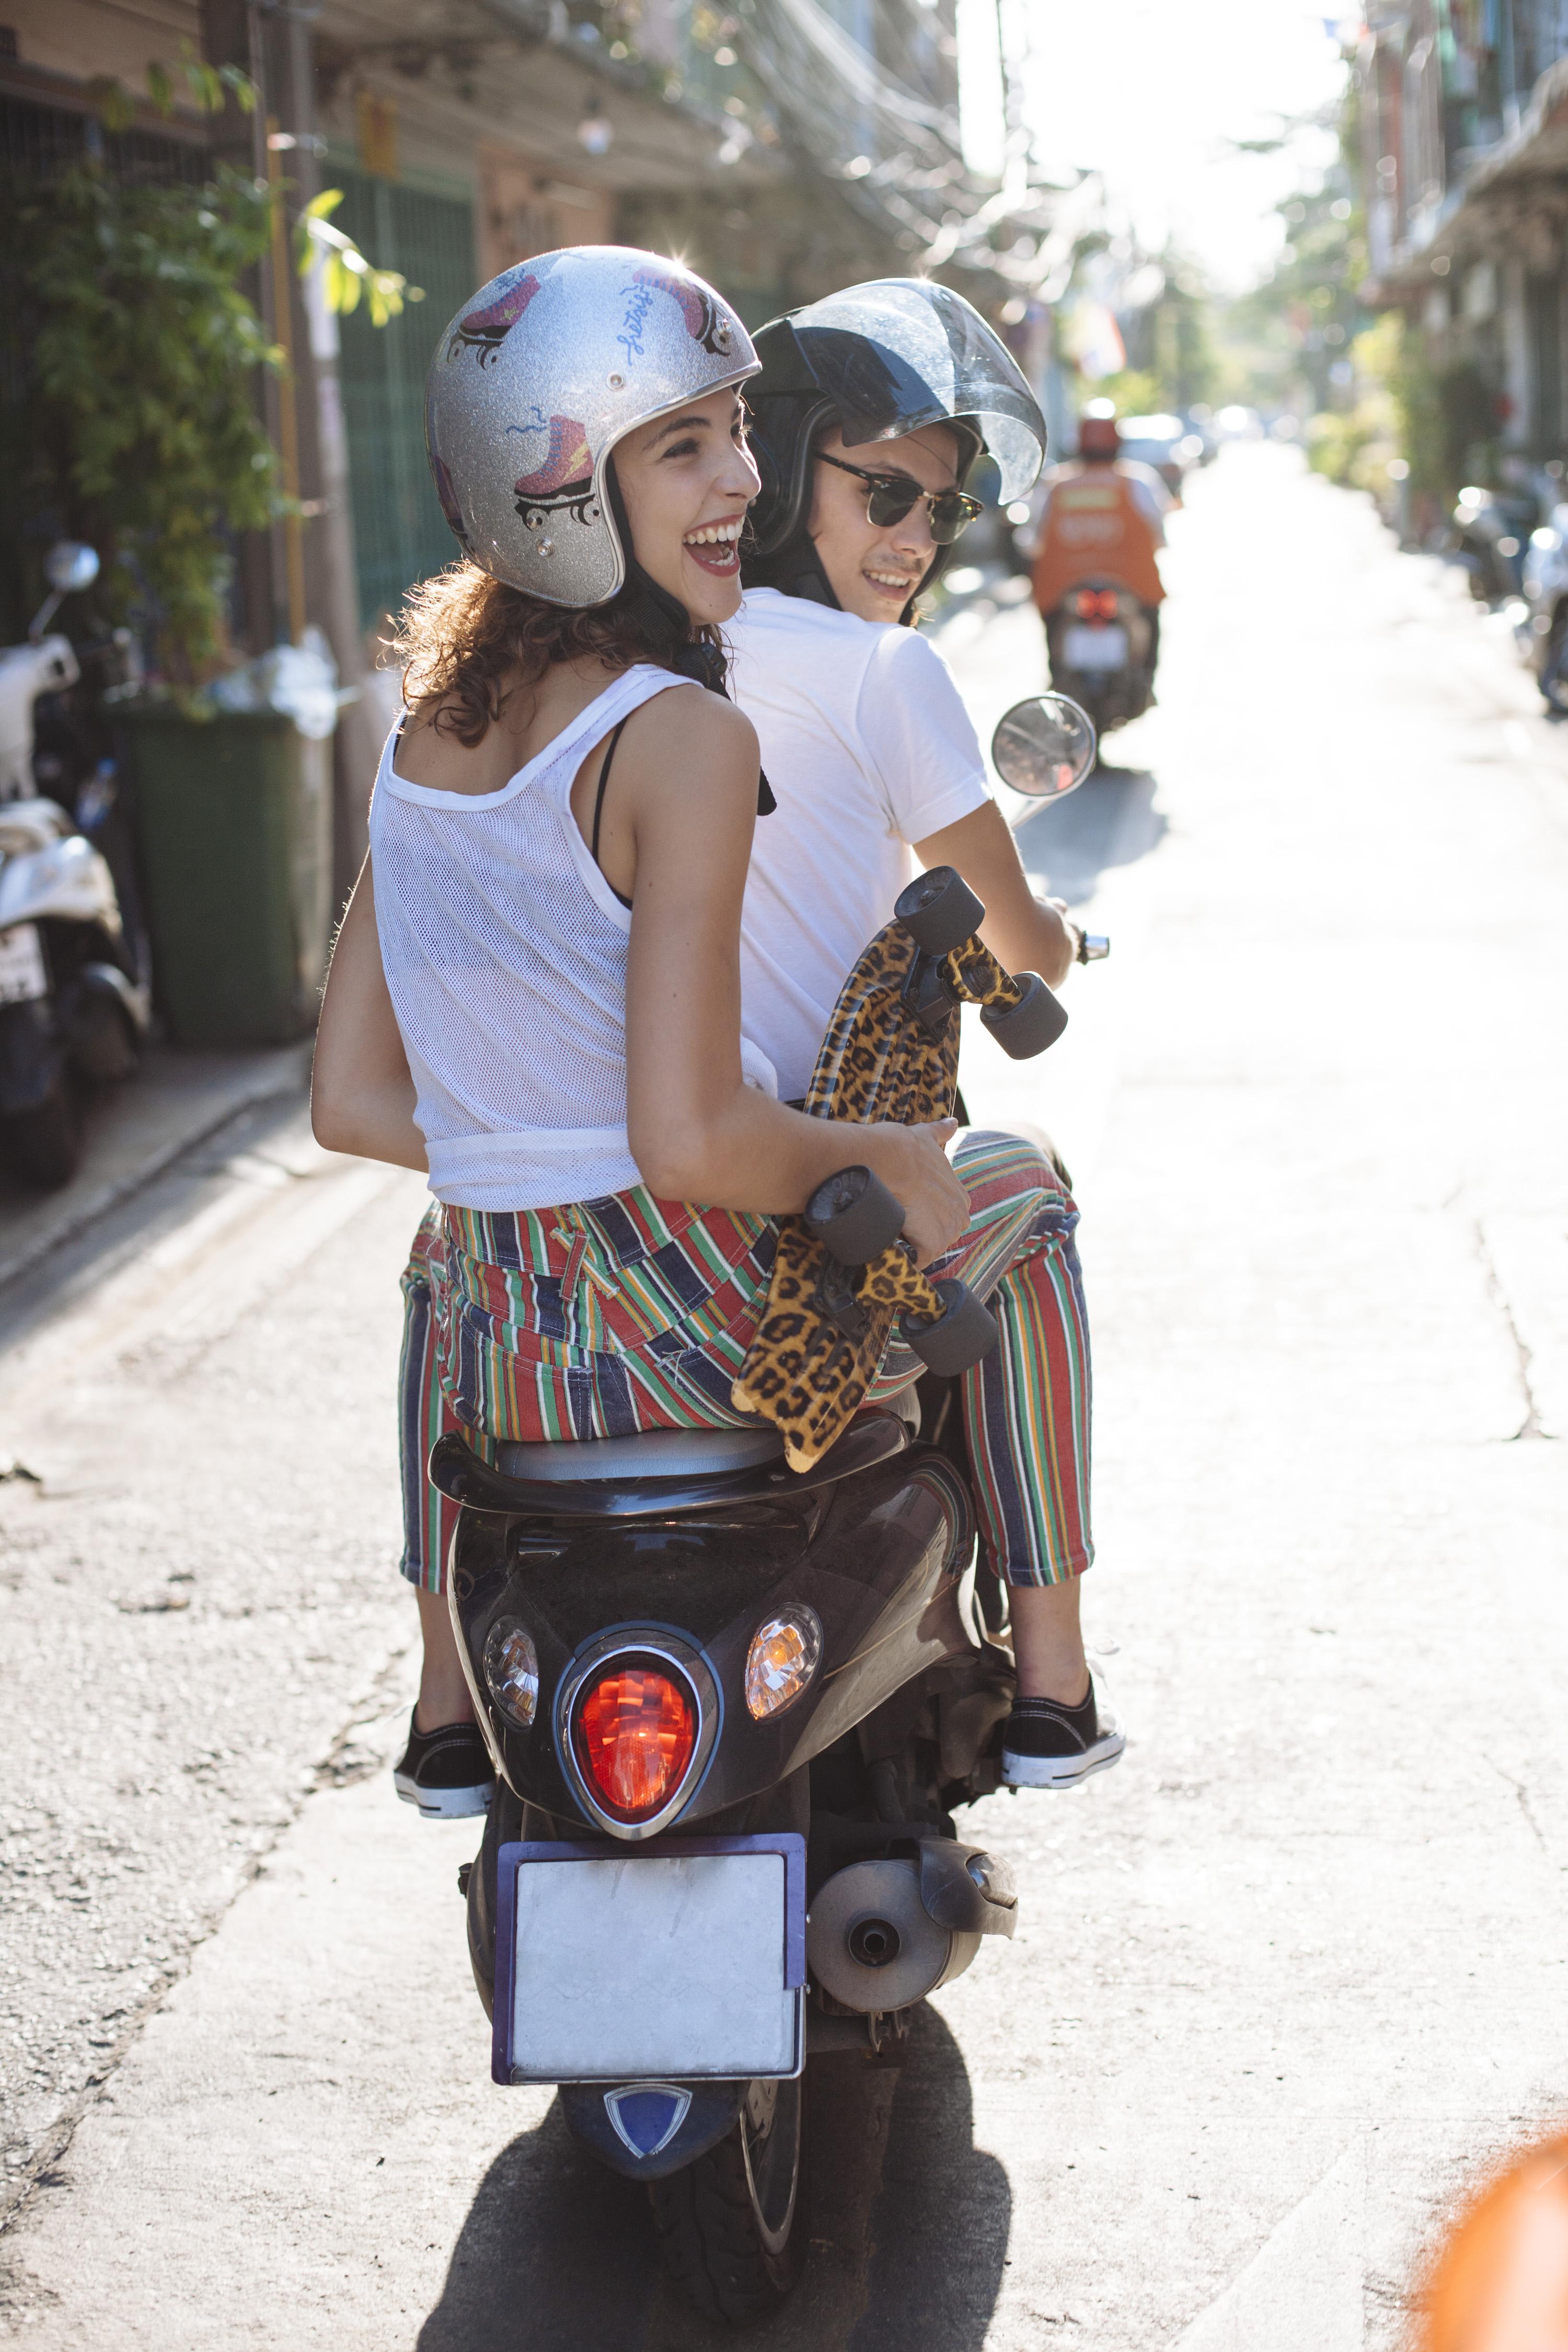 Pärchen auf Motorroller